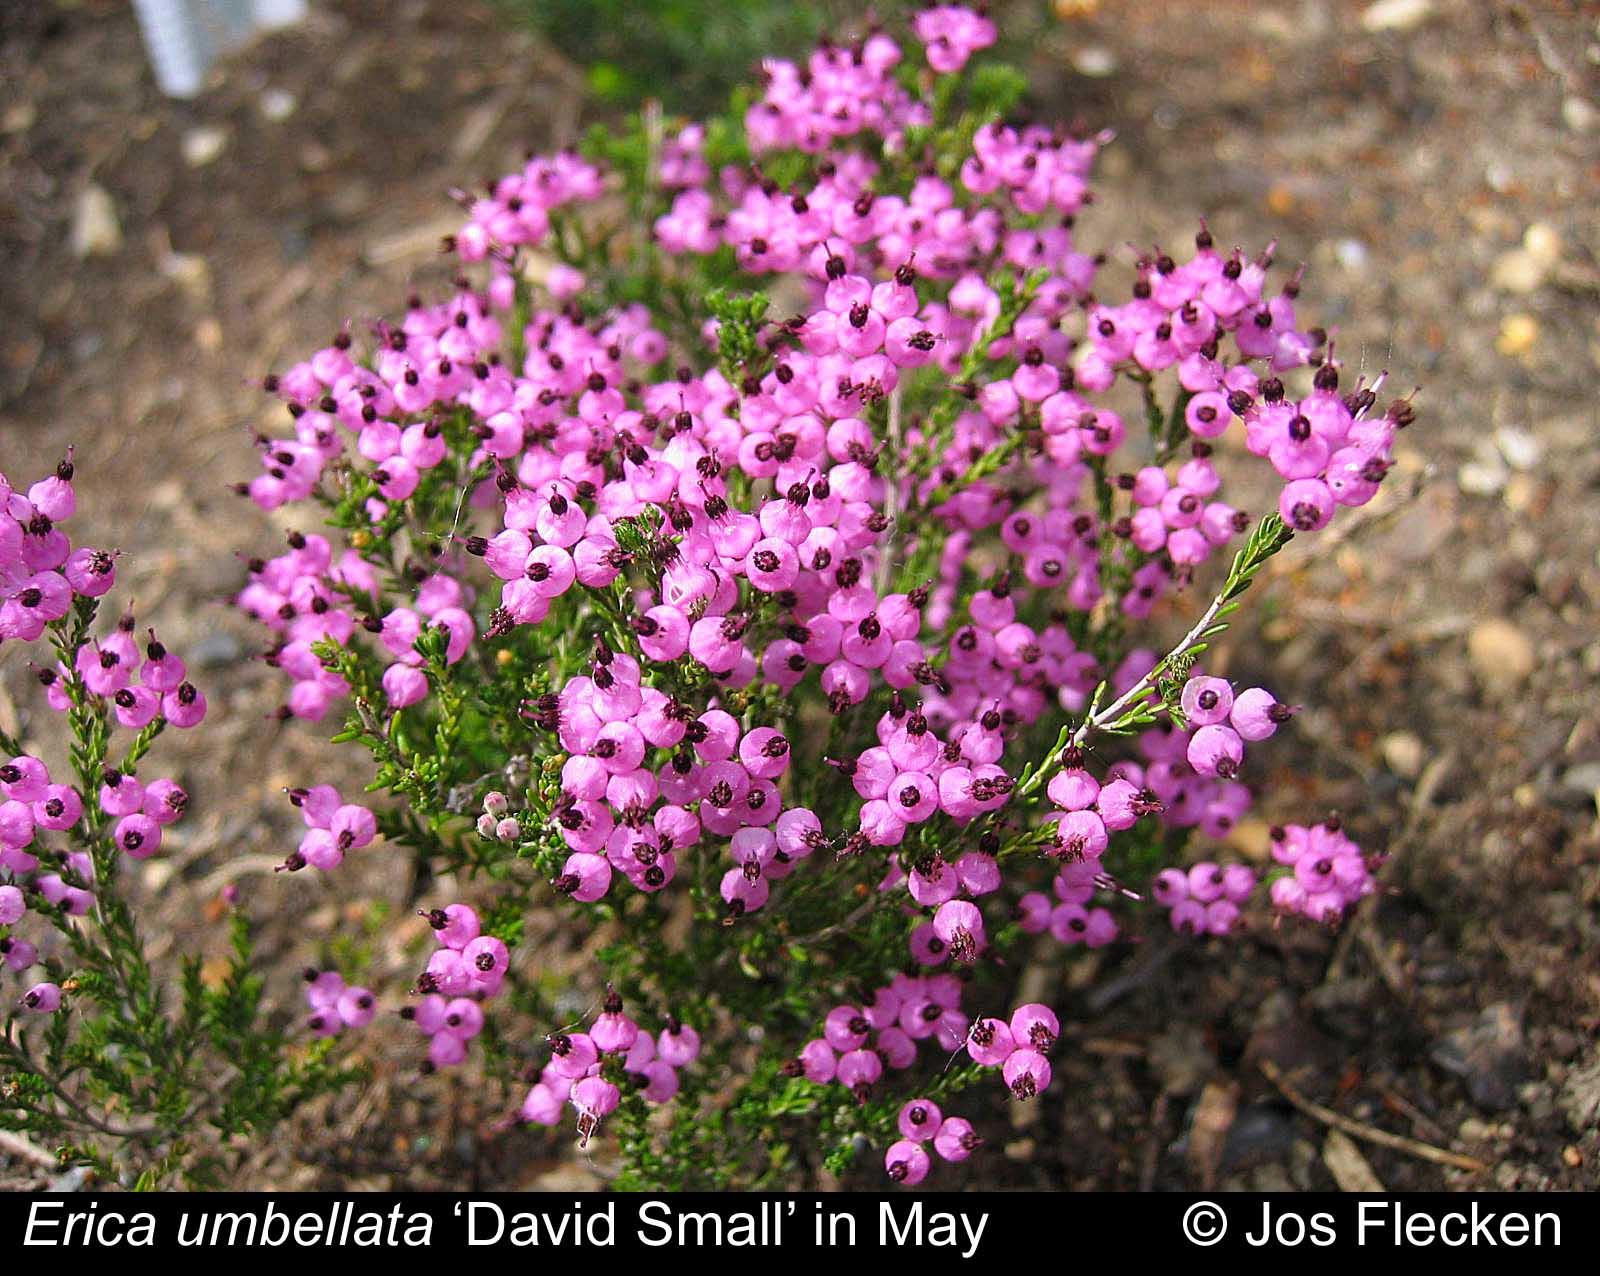 'David Small' (f. umbellata)